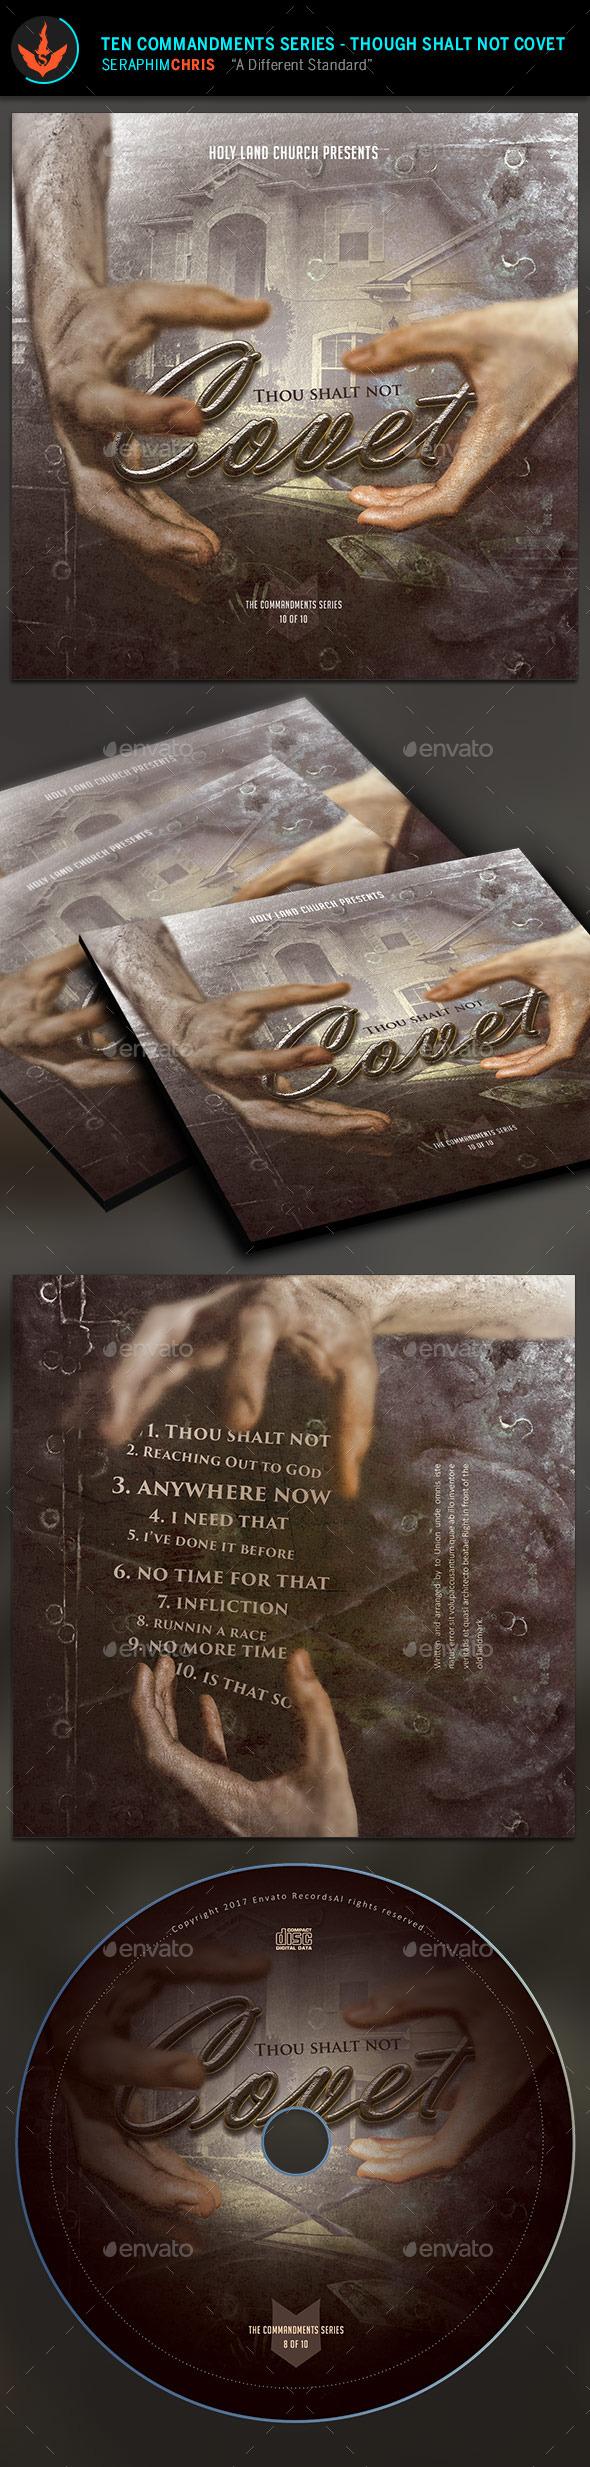 Don't Covet: CD Artwork Template - CD & DVD Artwork Print Templates